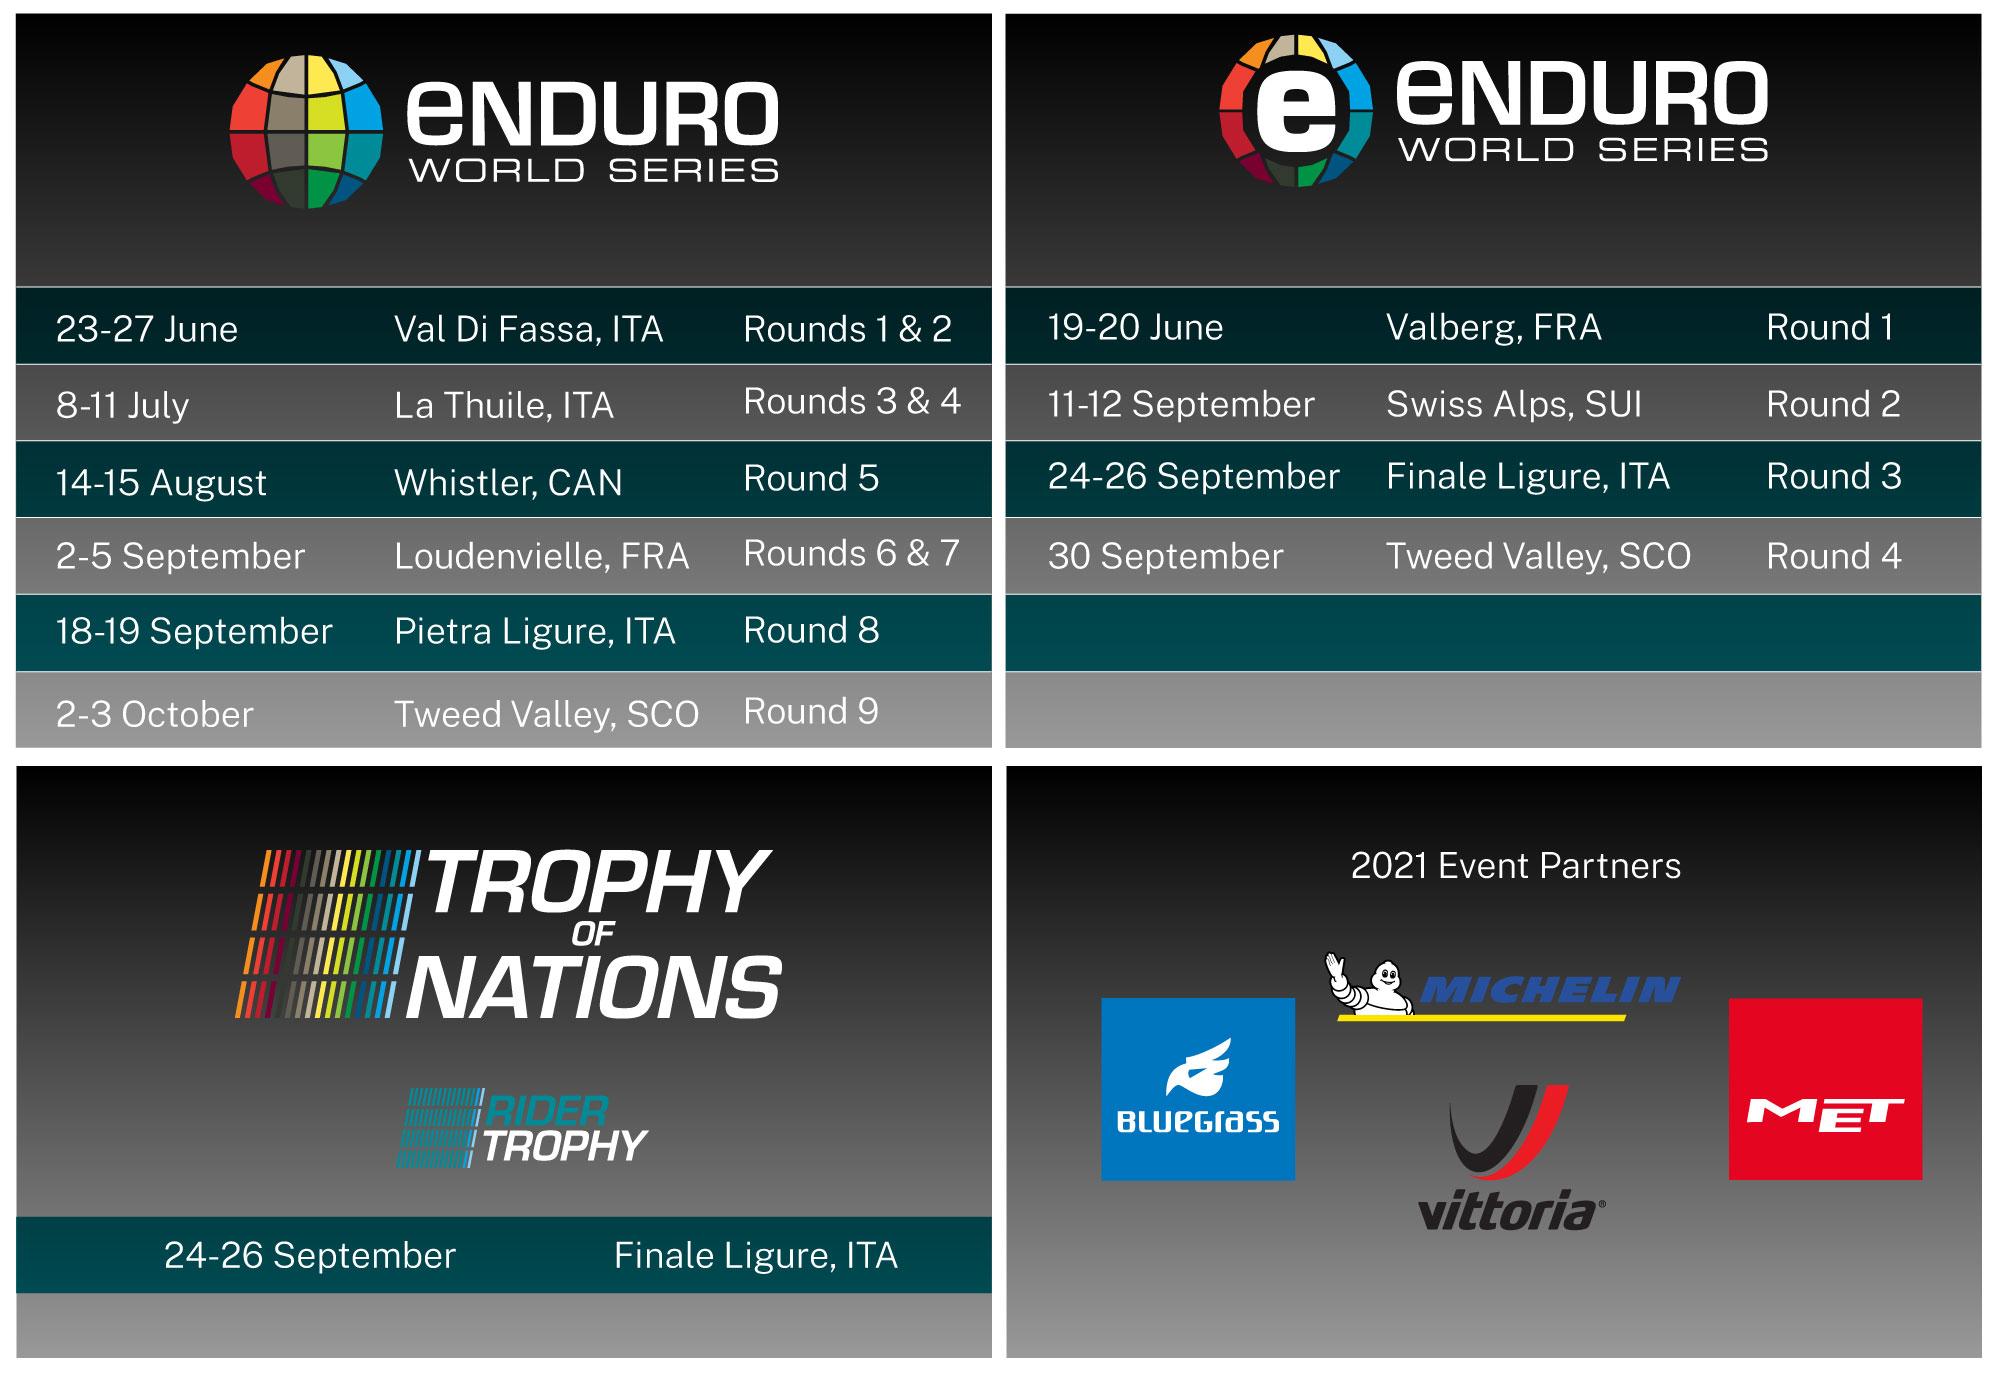 Calendrier Enduro 2021 Calendrier Enduro World Series 2021   14 courses au programme !